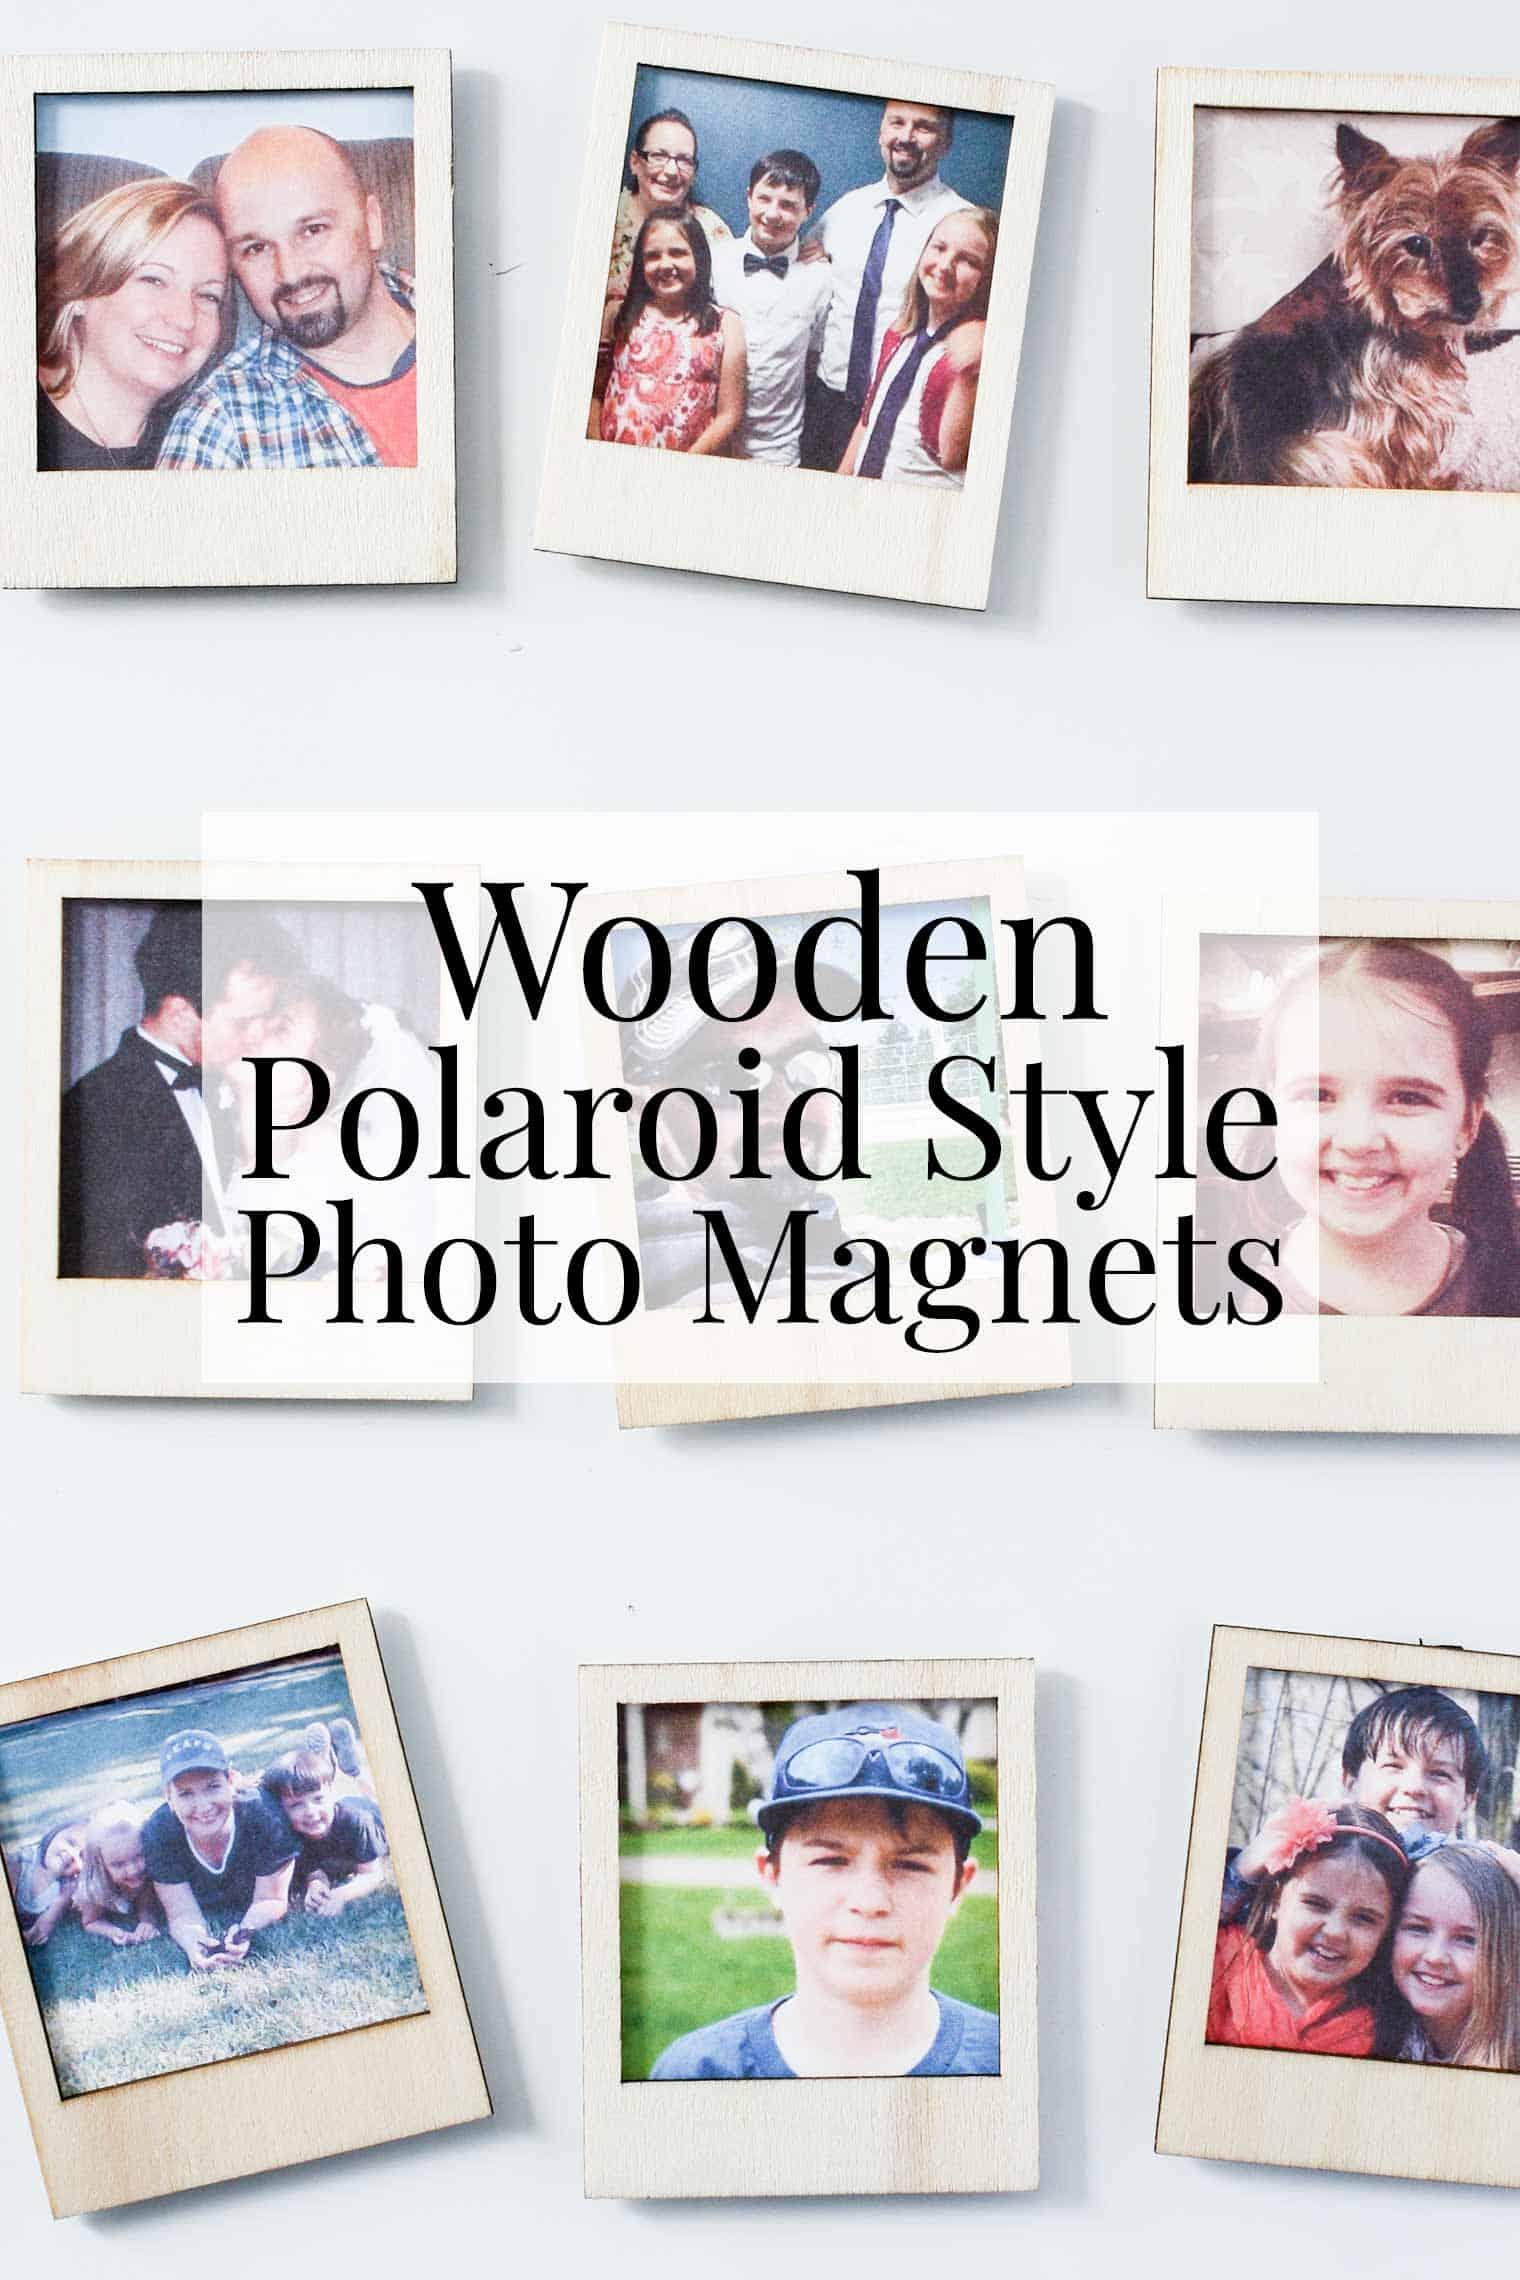 wooden Polaroid style framed family photos on the fridge